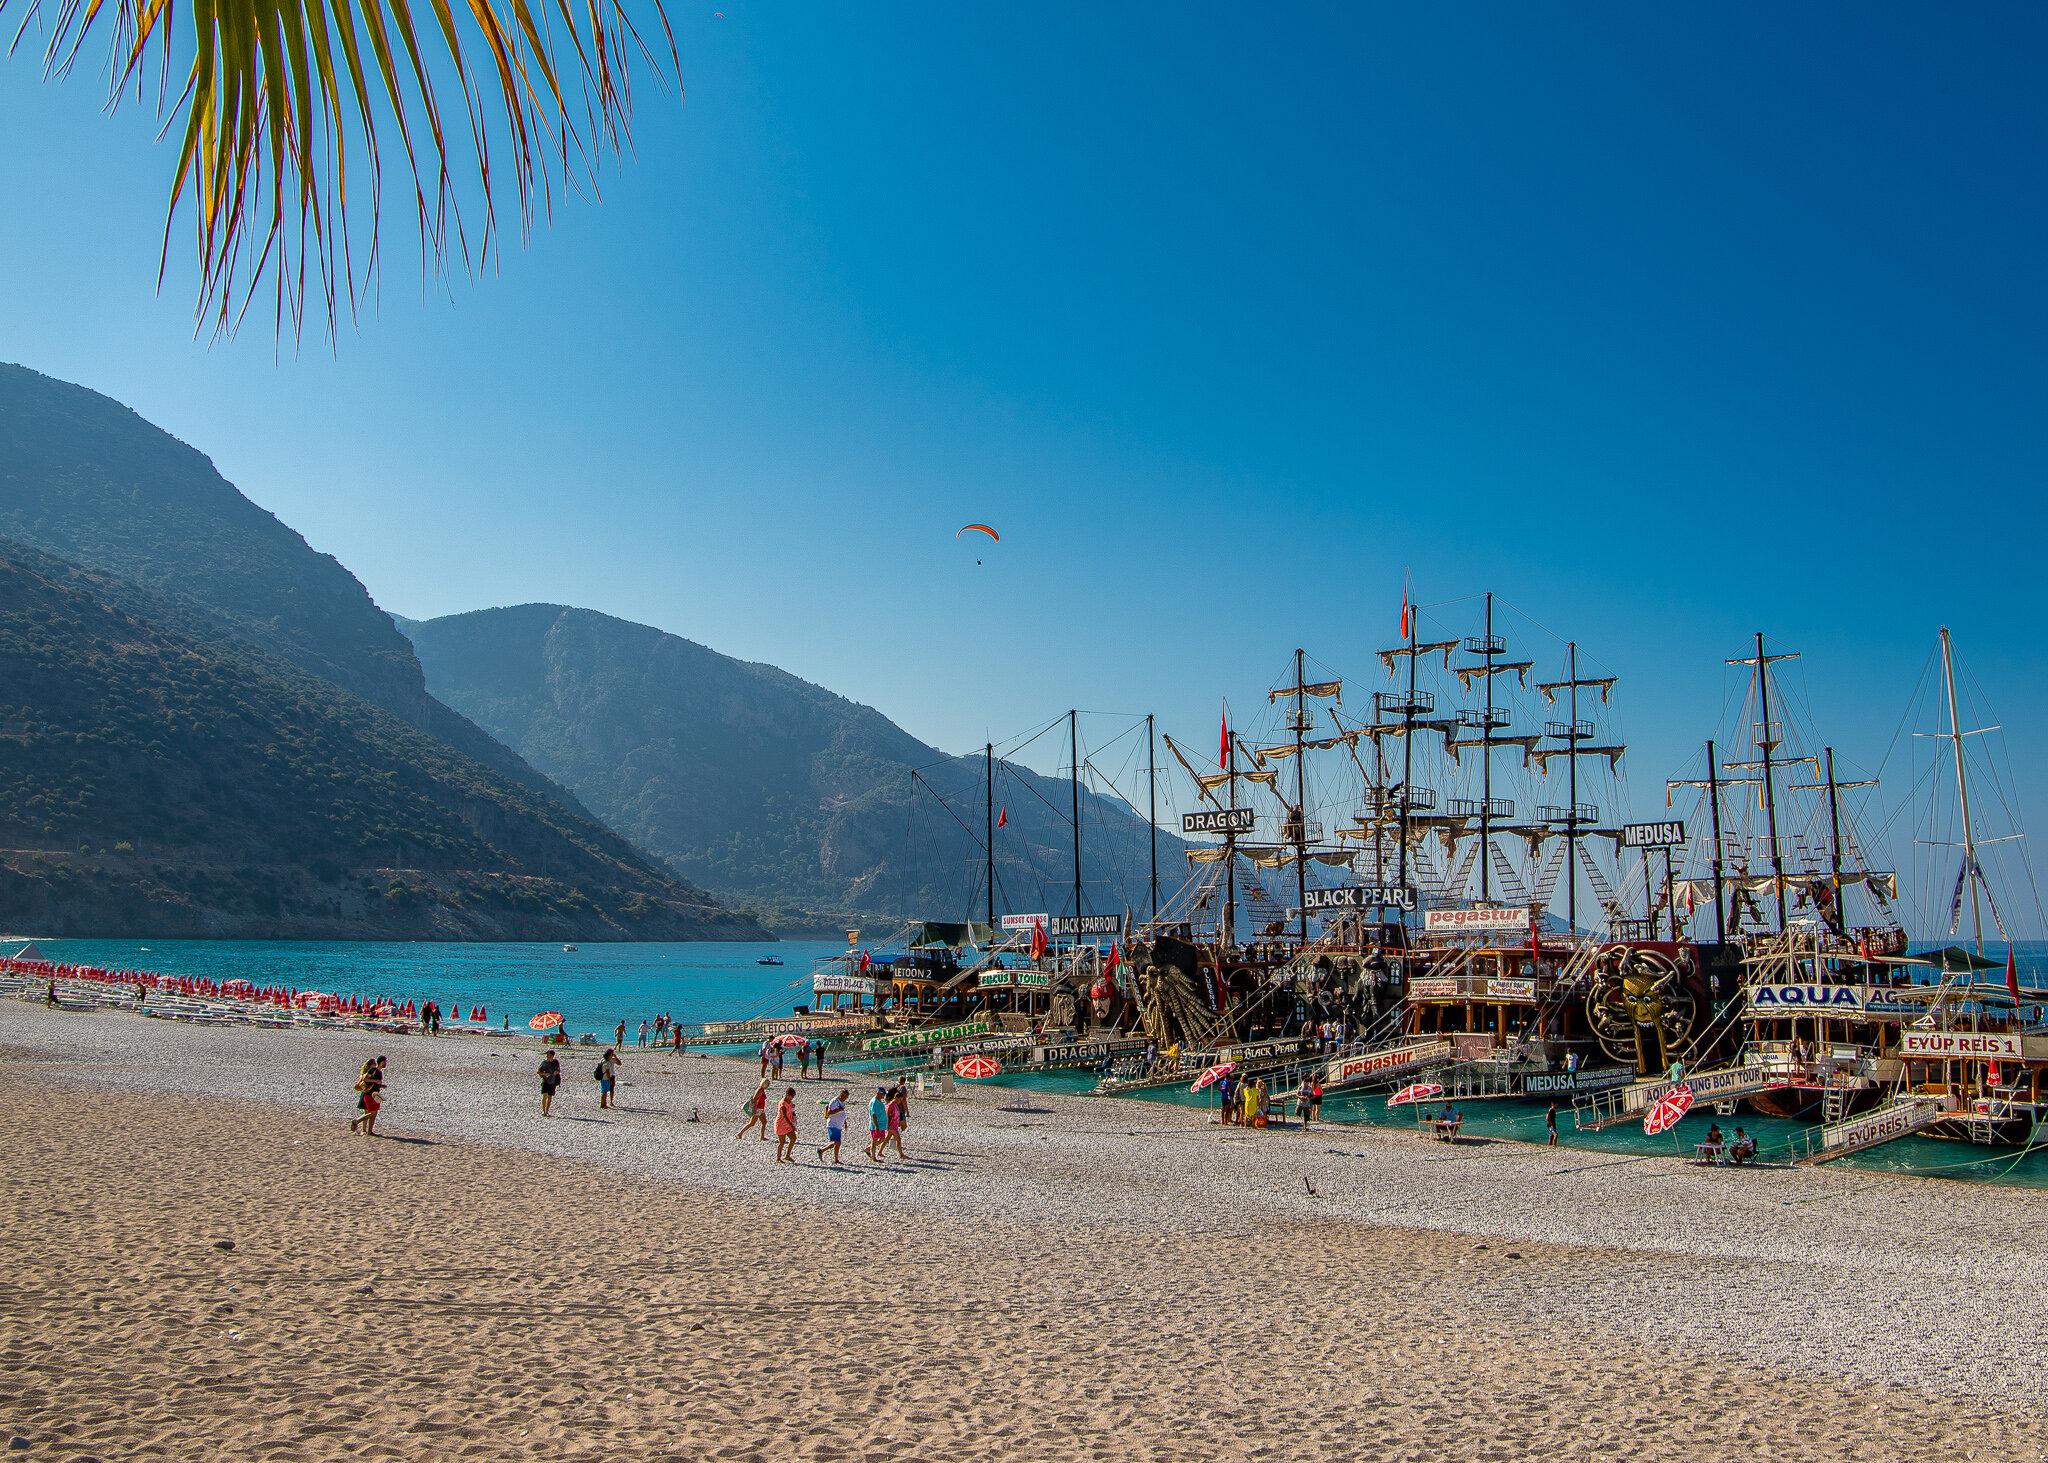 Pirate ships galore on Oludeniz Beach